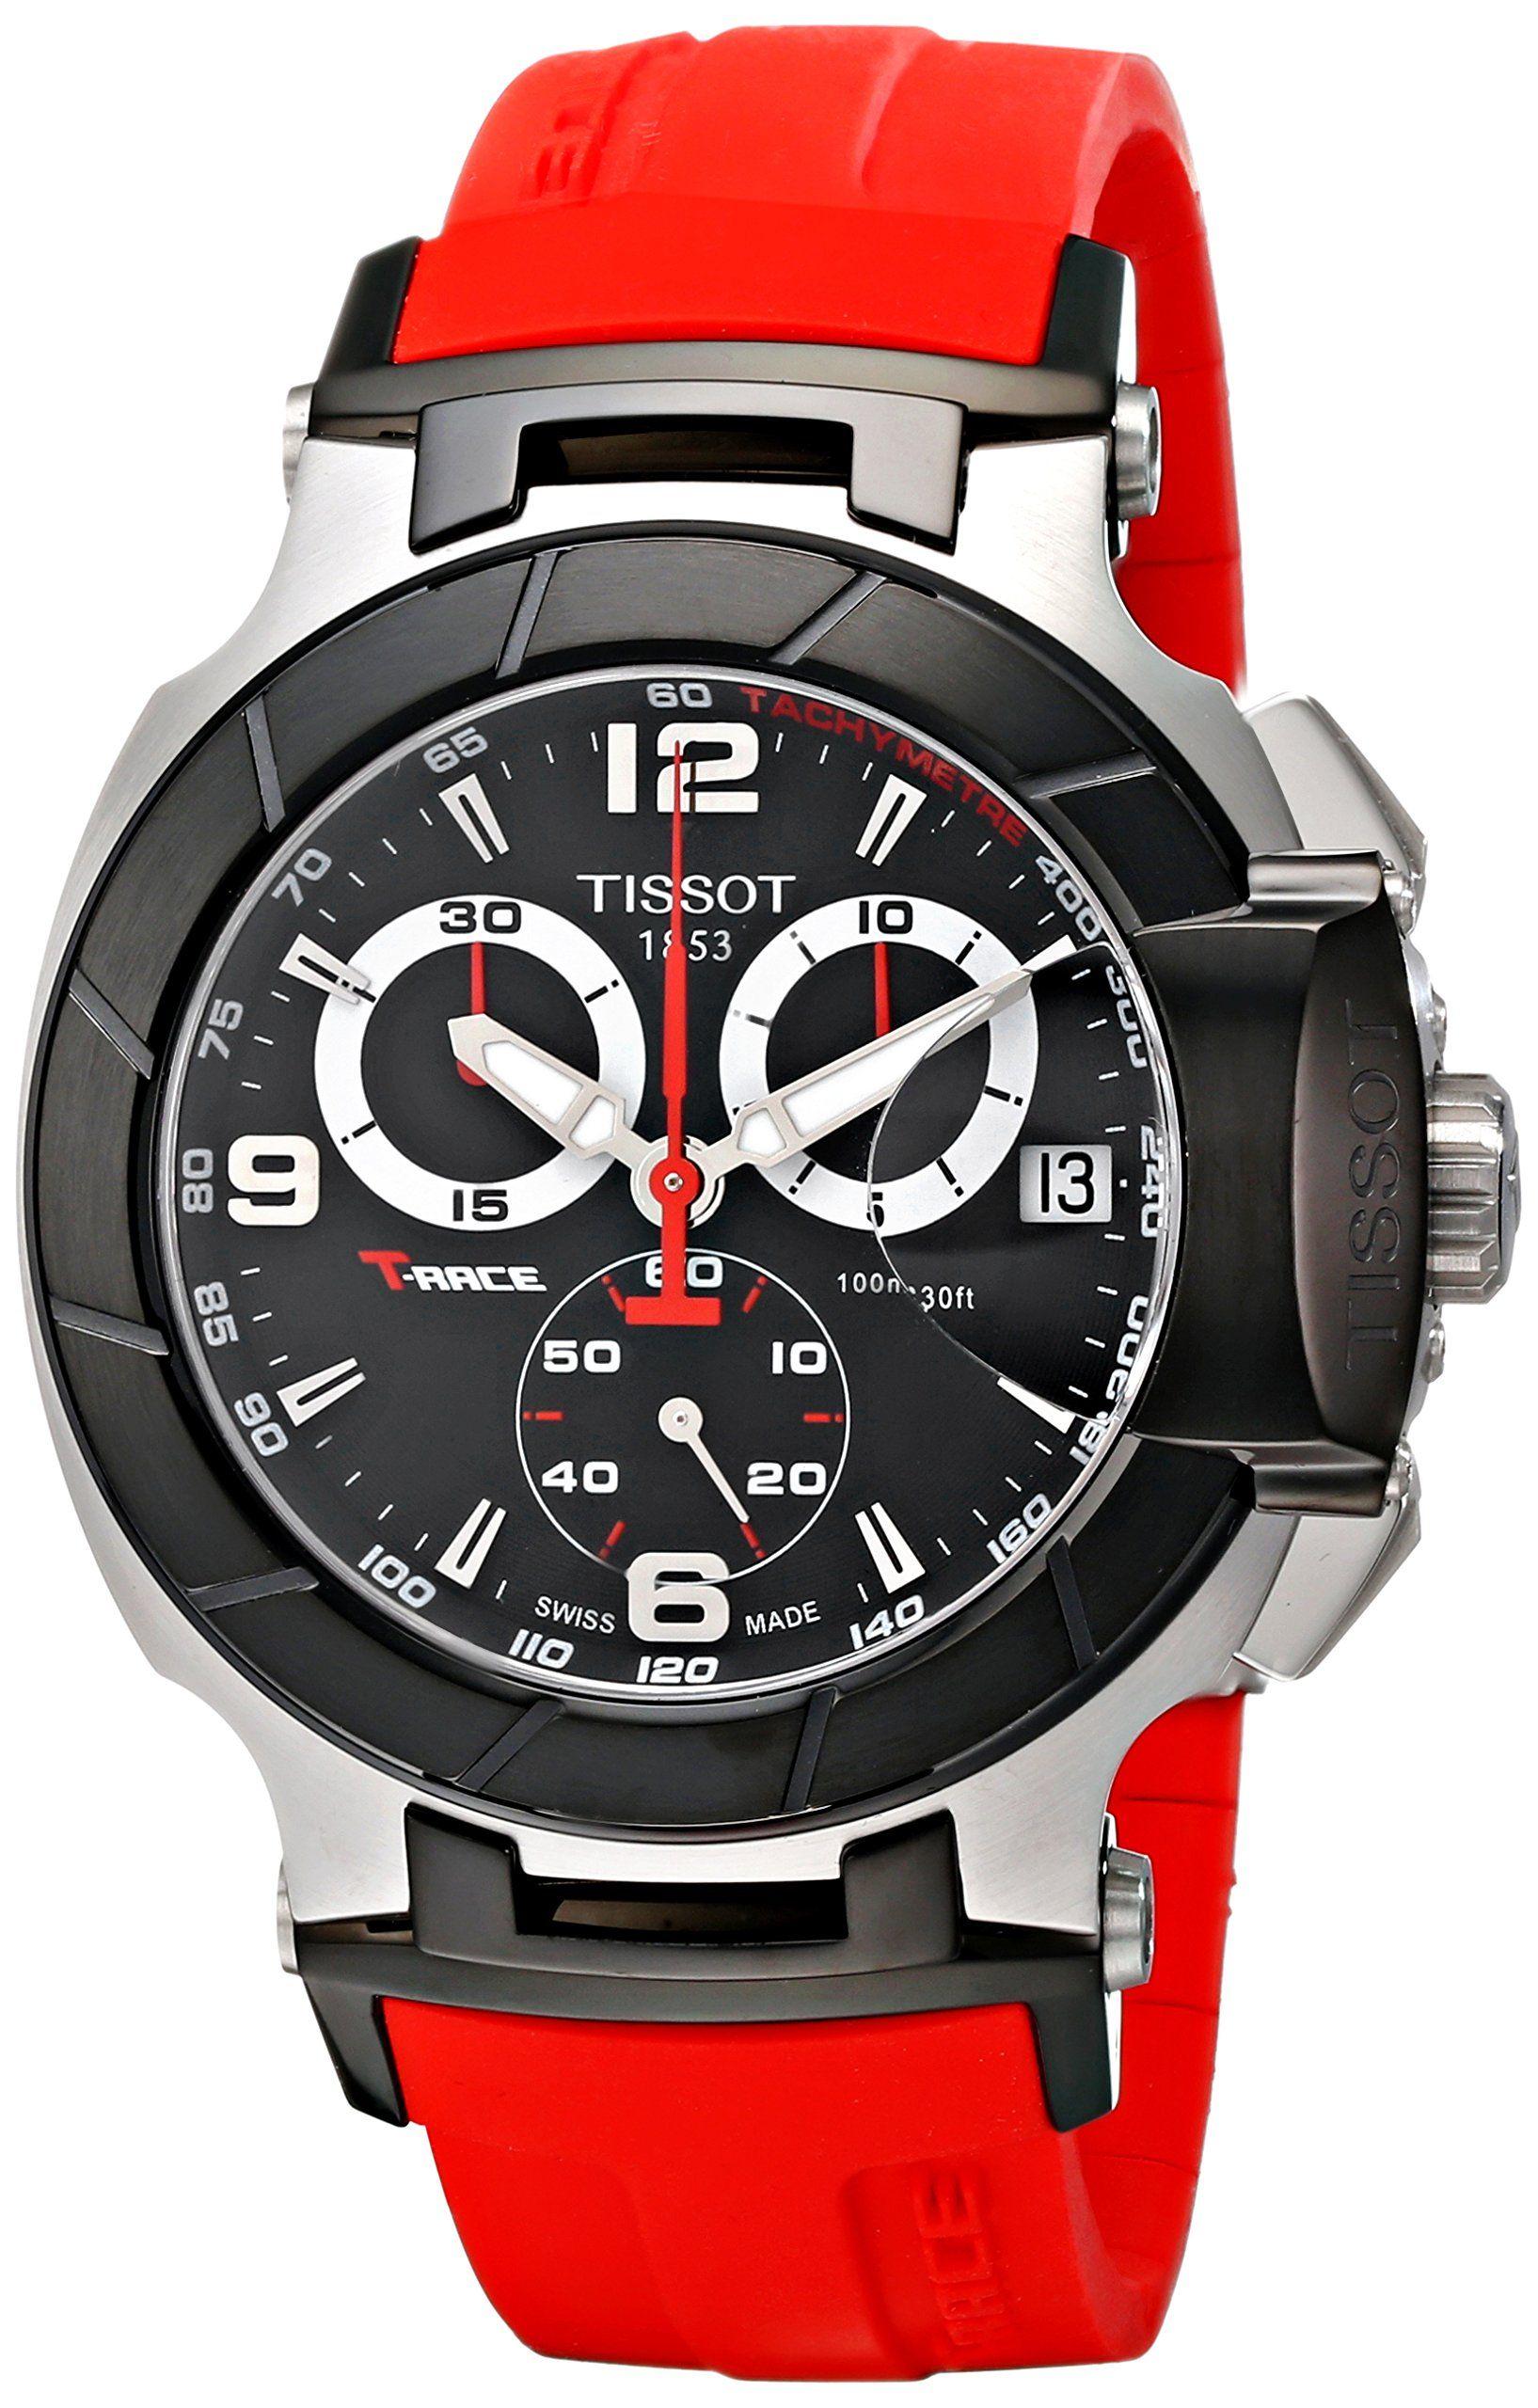 Tissot Men s T0484172705701 T-Race Red Strap Chronograph Watch  Tissot   Watches e8a1a1c7b9d